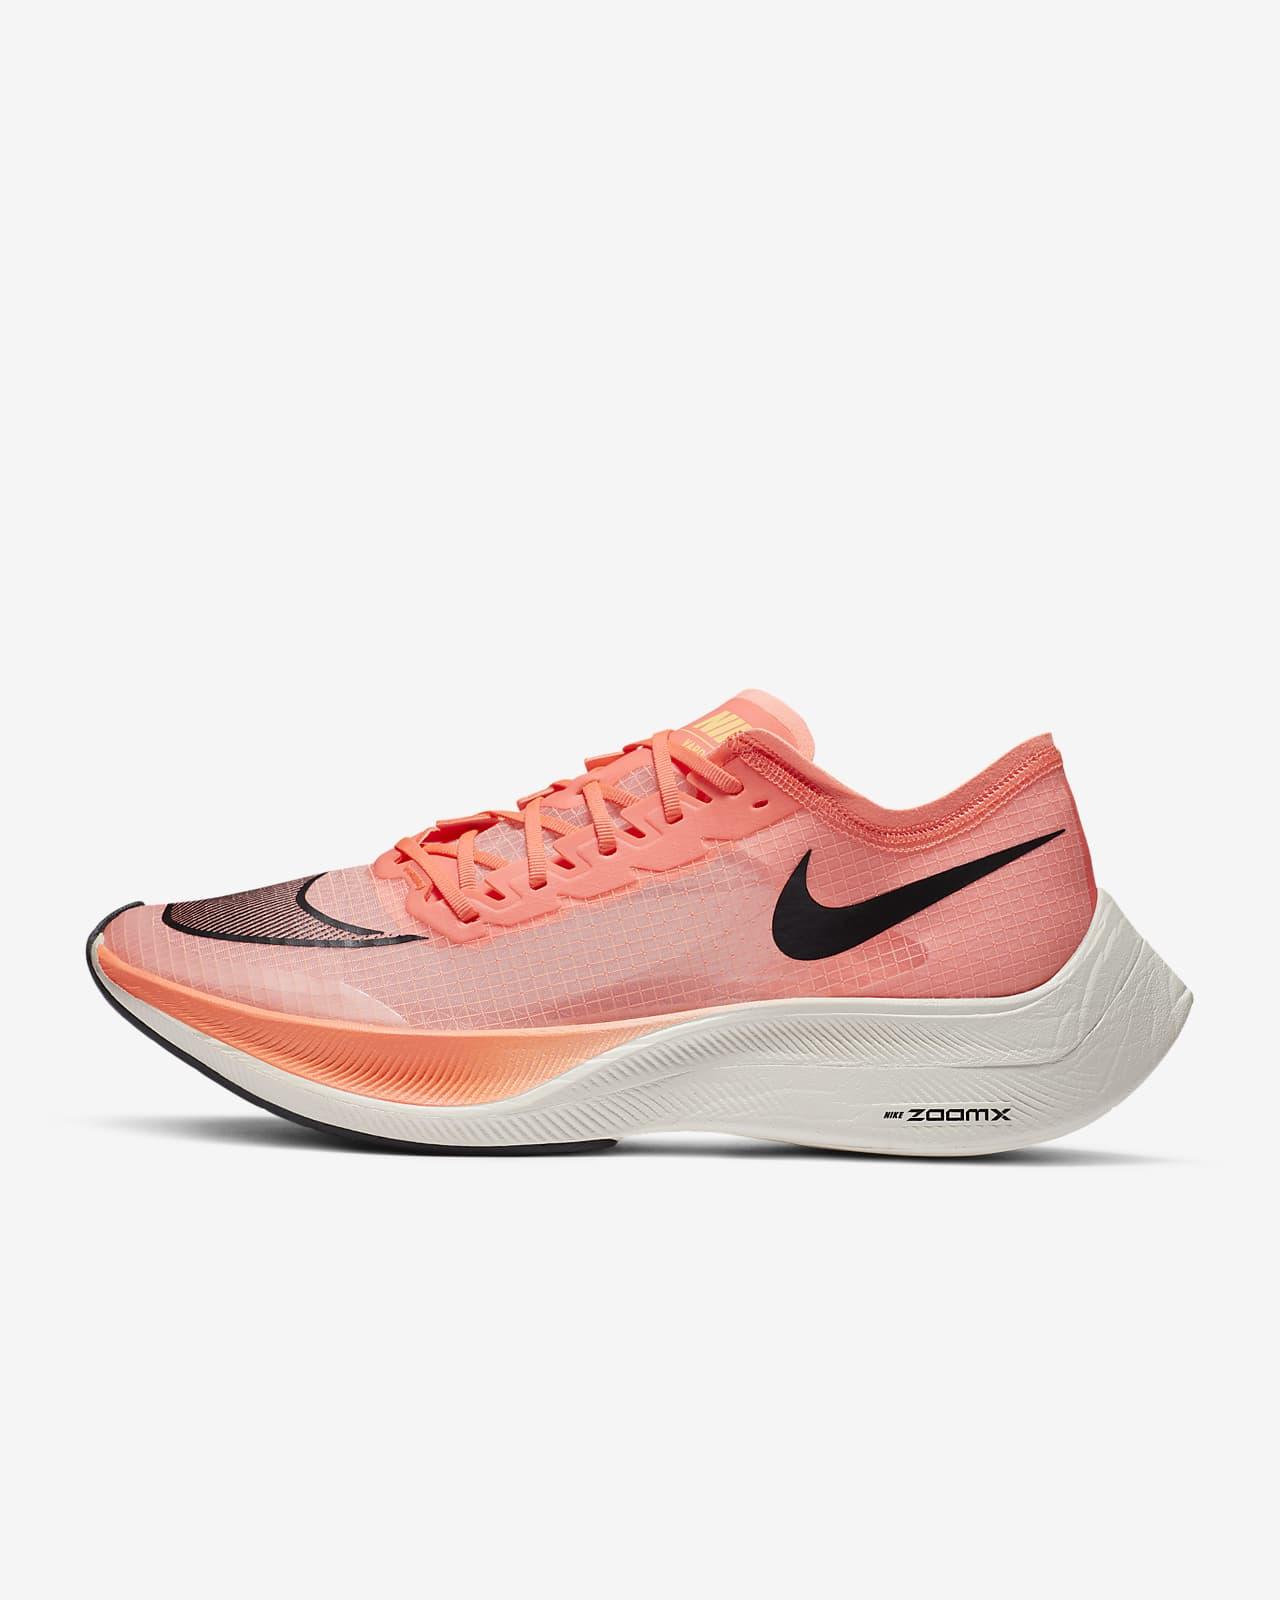 Nike ZoomX Vaporfly NEXT% Hardloopschoen